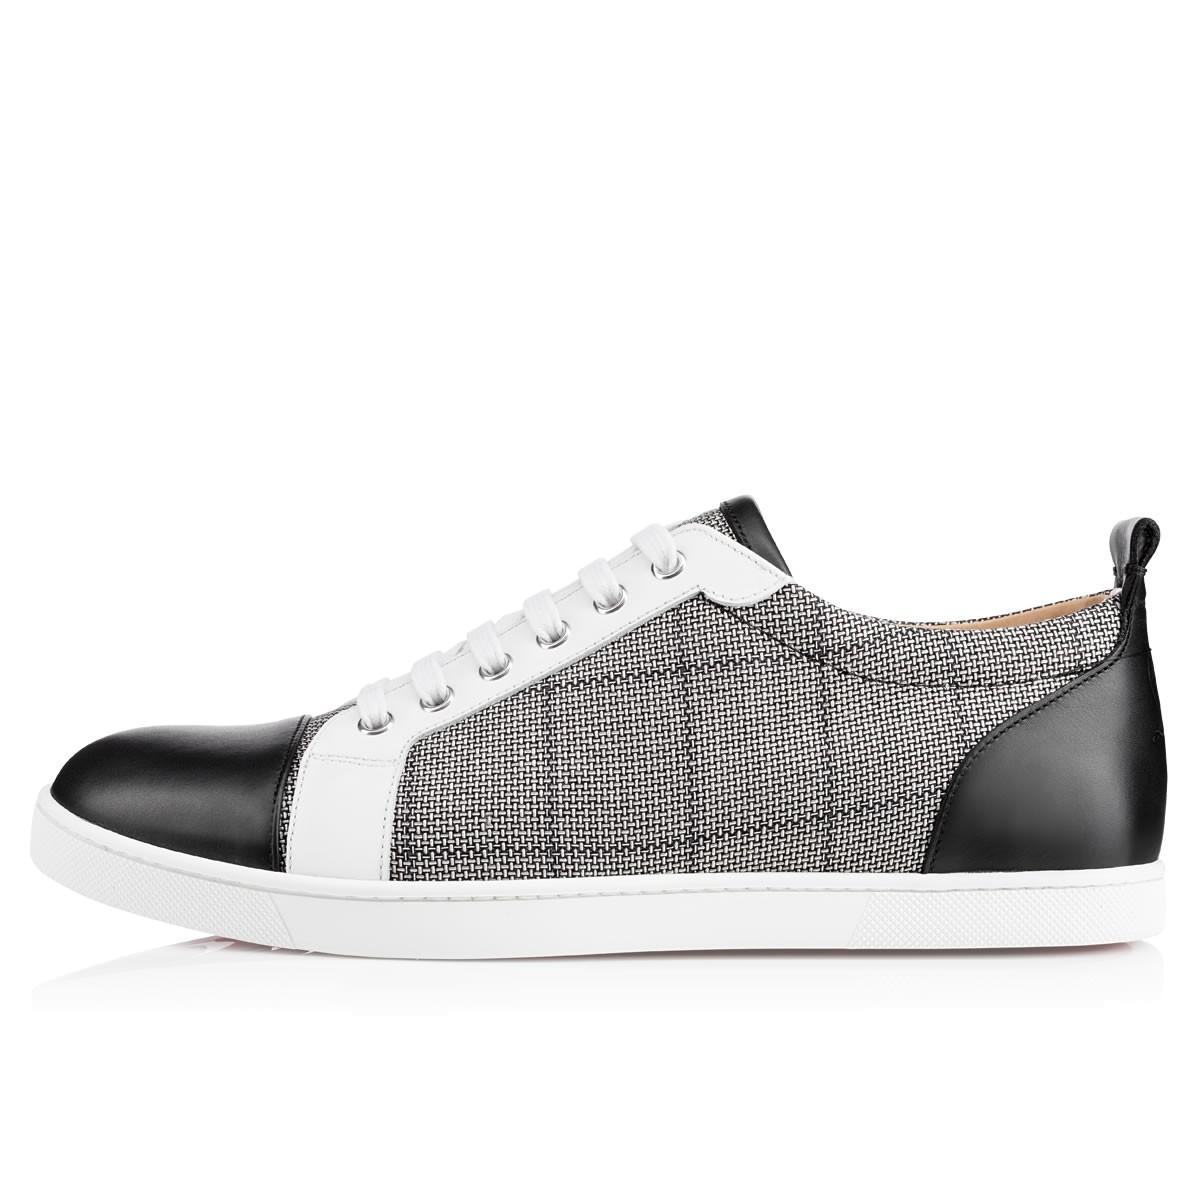 replica louis vuitton loafers - louboutin gondoliere women\u0026#39;s flat Black - Catholic Commission for ...